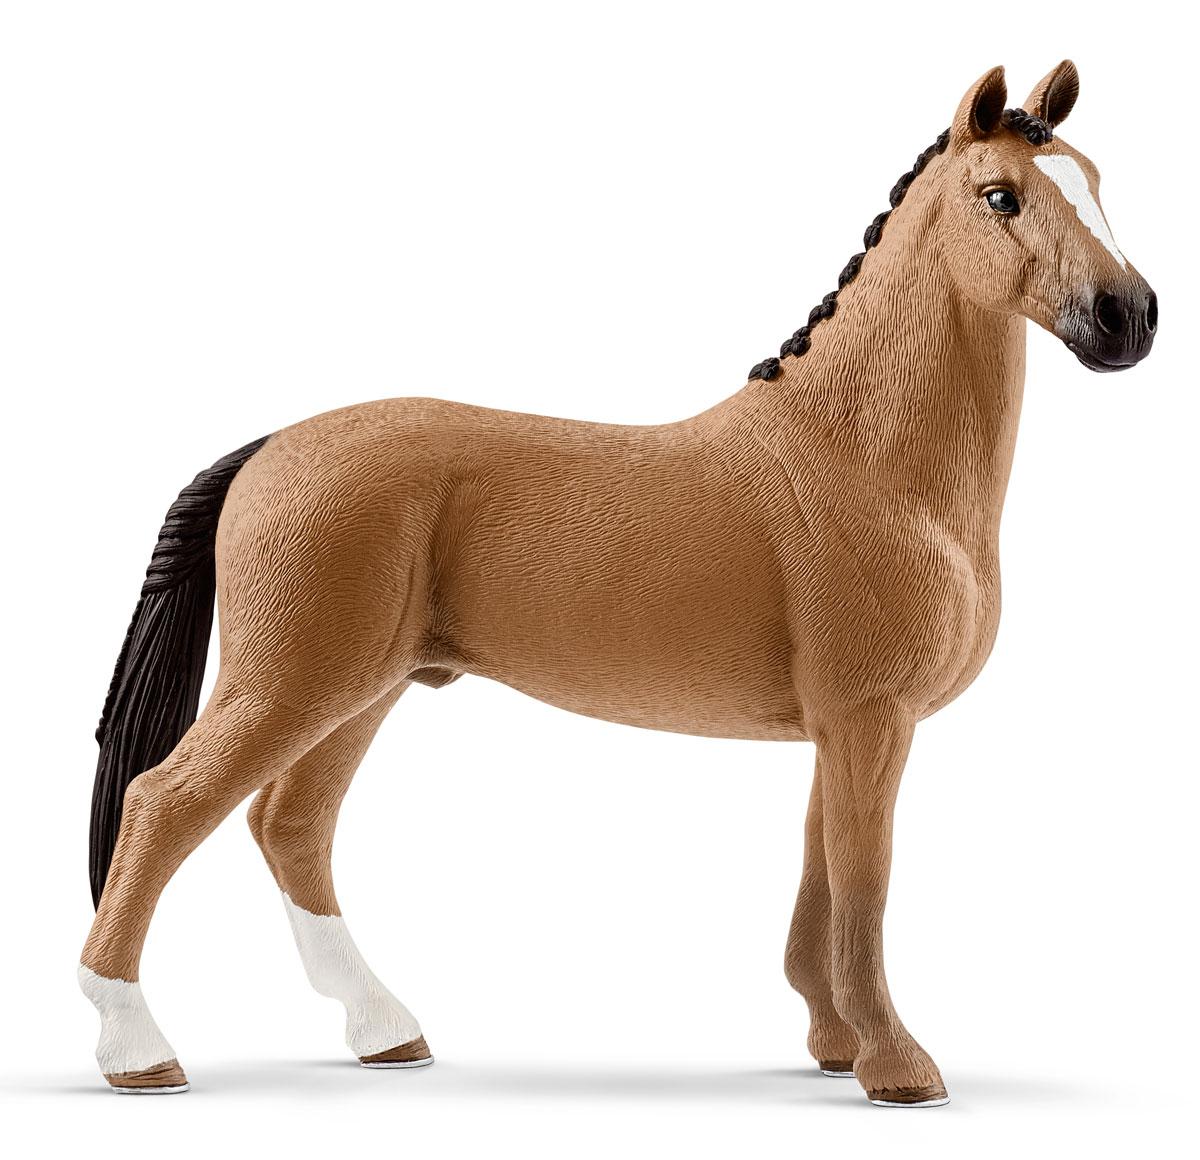 Schleich Фигурка Ганноверский жеребец 13837 фигурка карликовый козел schleich фигурка карликовый козел